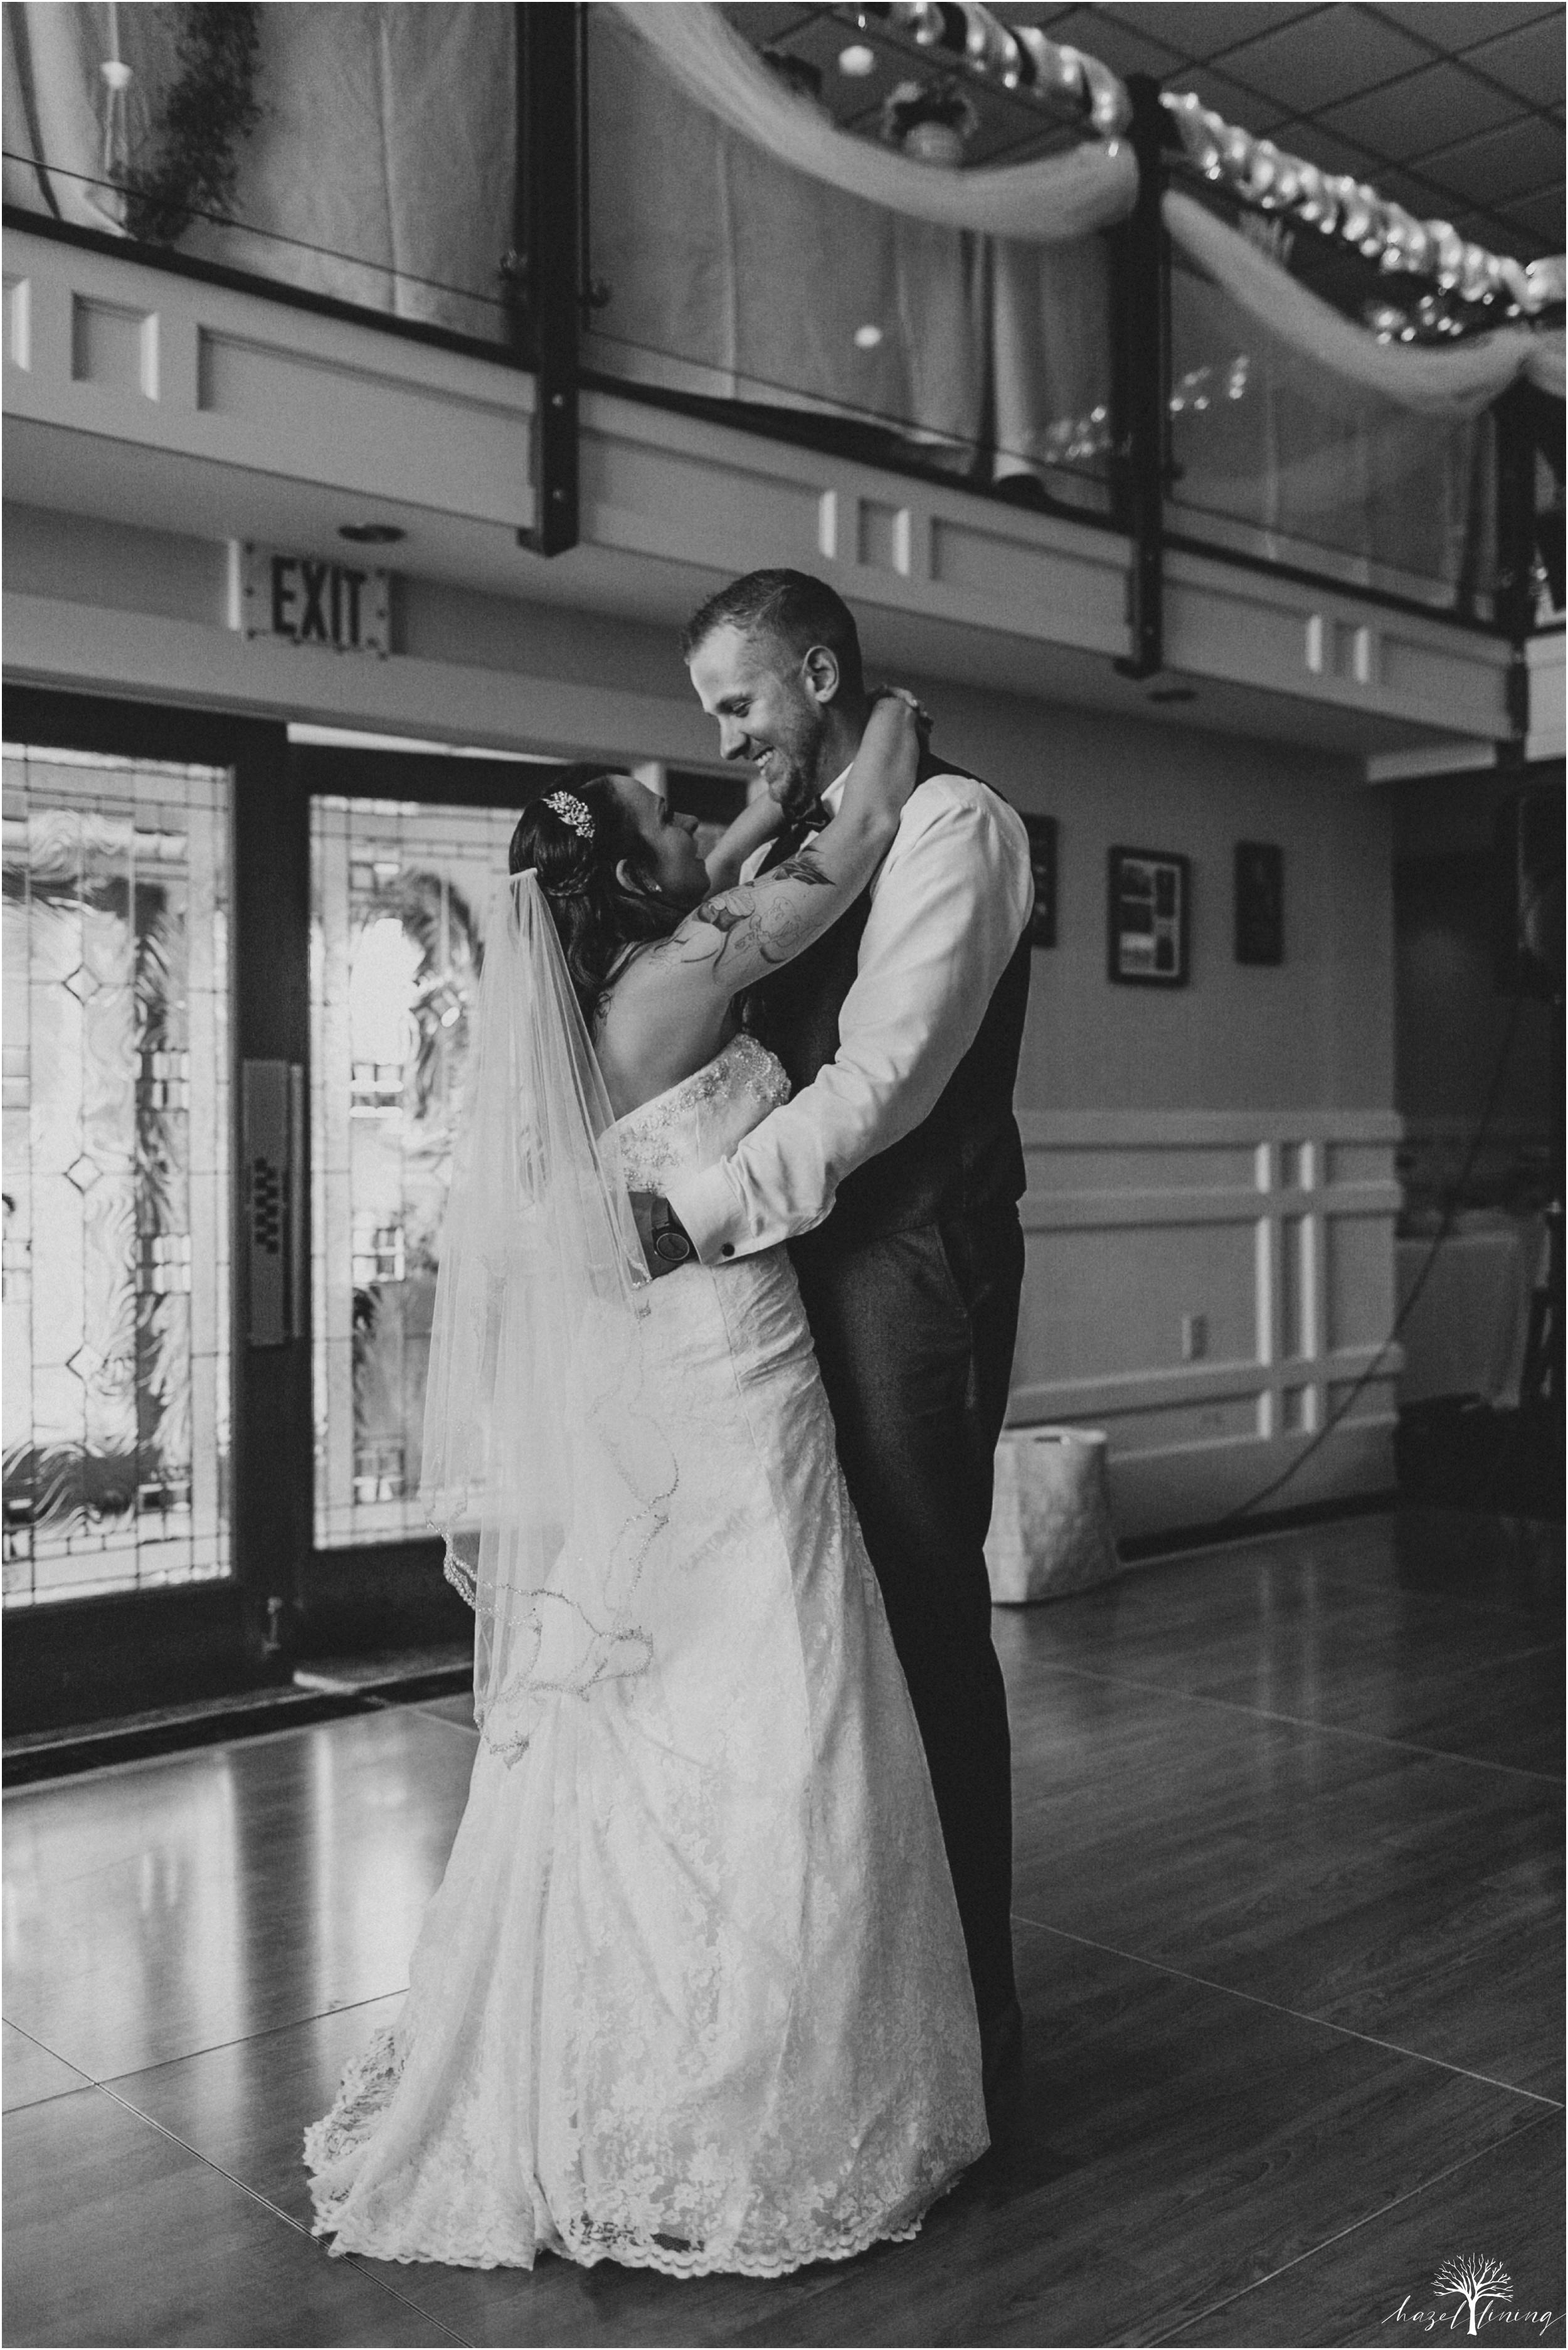 alyssa-james-stiteler-wedding-loft-and-sweet-water-cc-pennsburg-pennsylvania-hazel-lining-travel-wedding-elopement-photography_0123.jpg